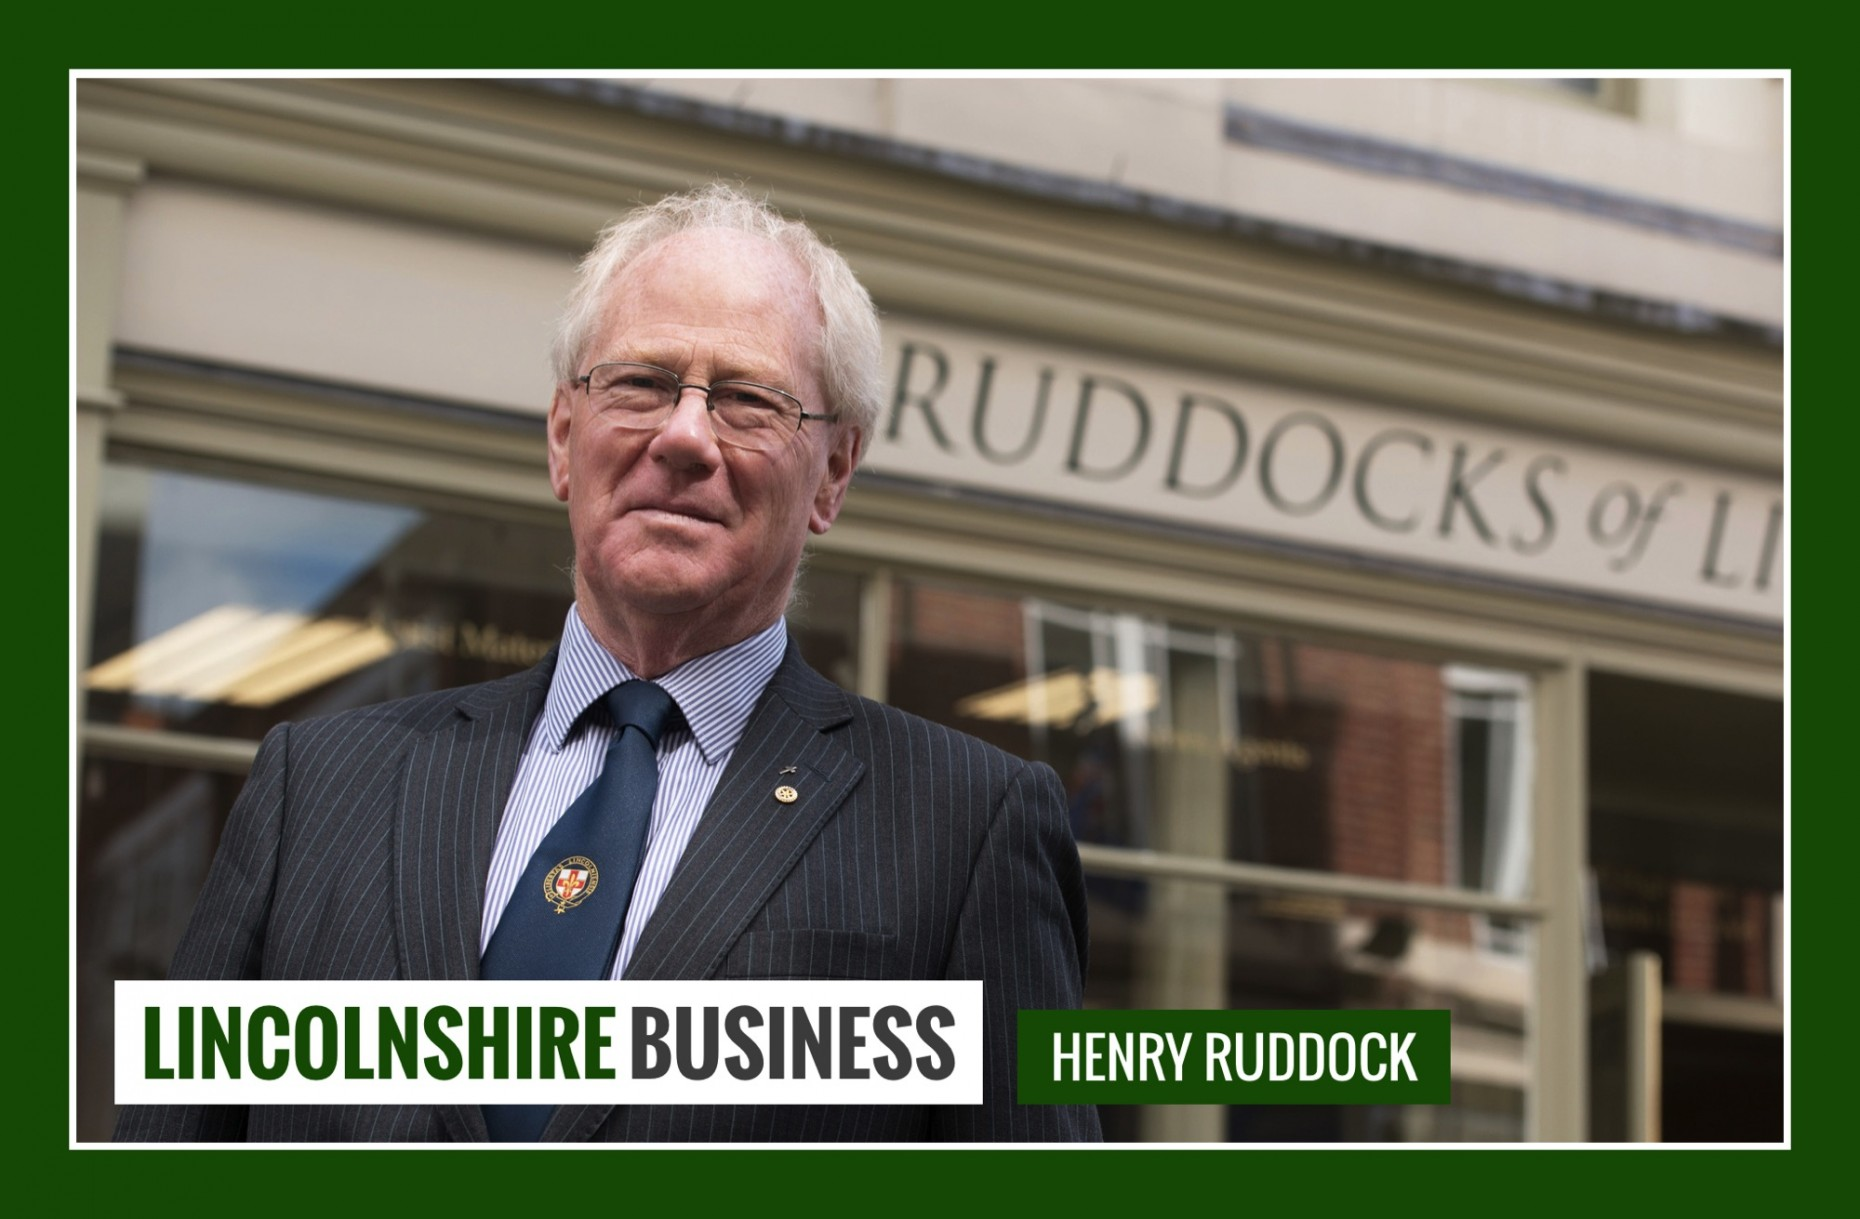 Lincolnshire Business 29 Henry Ruddock